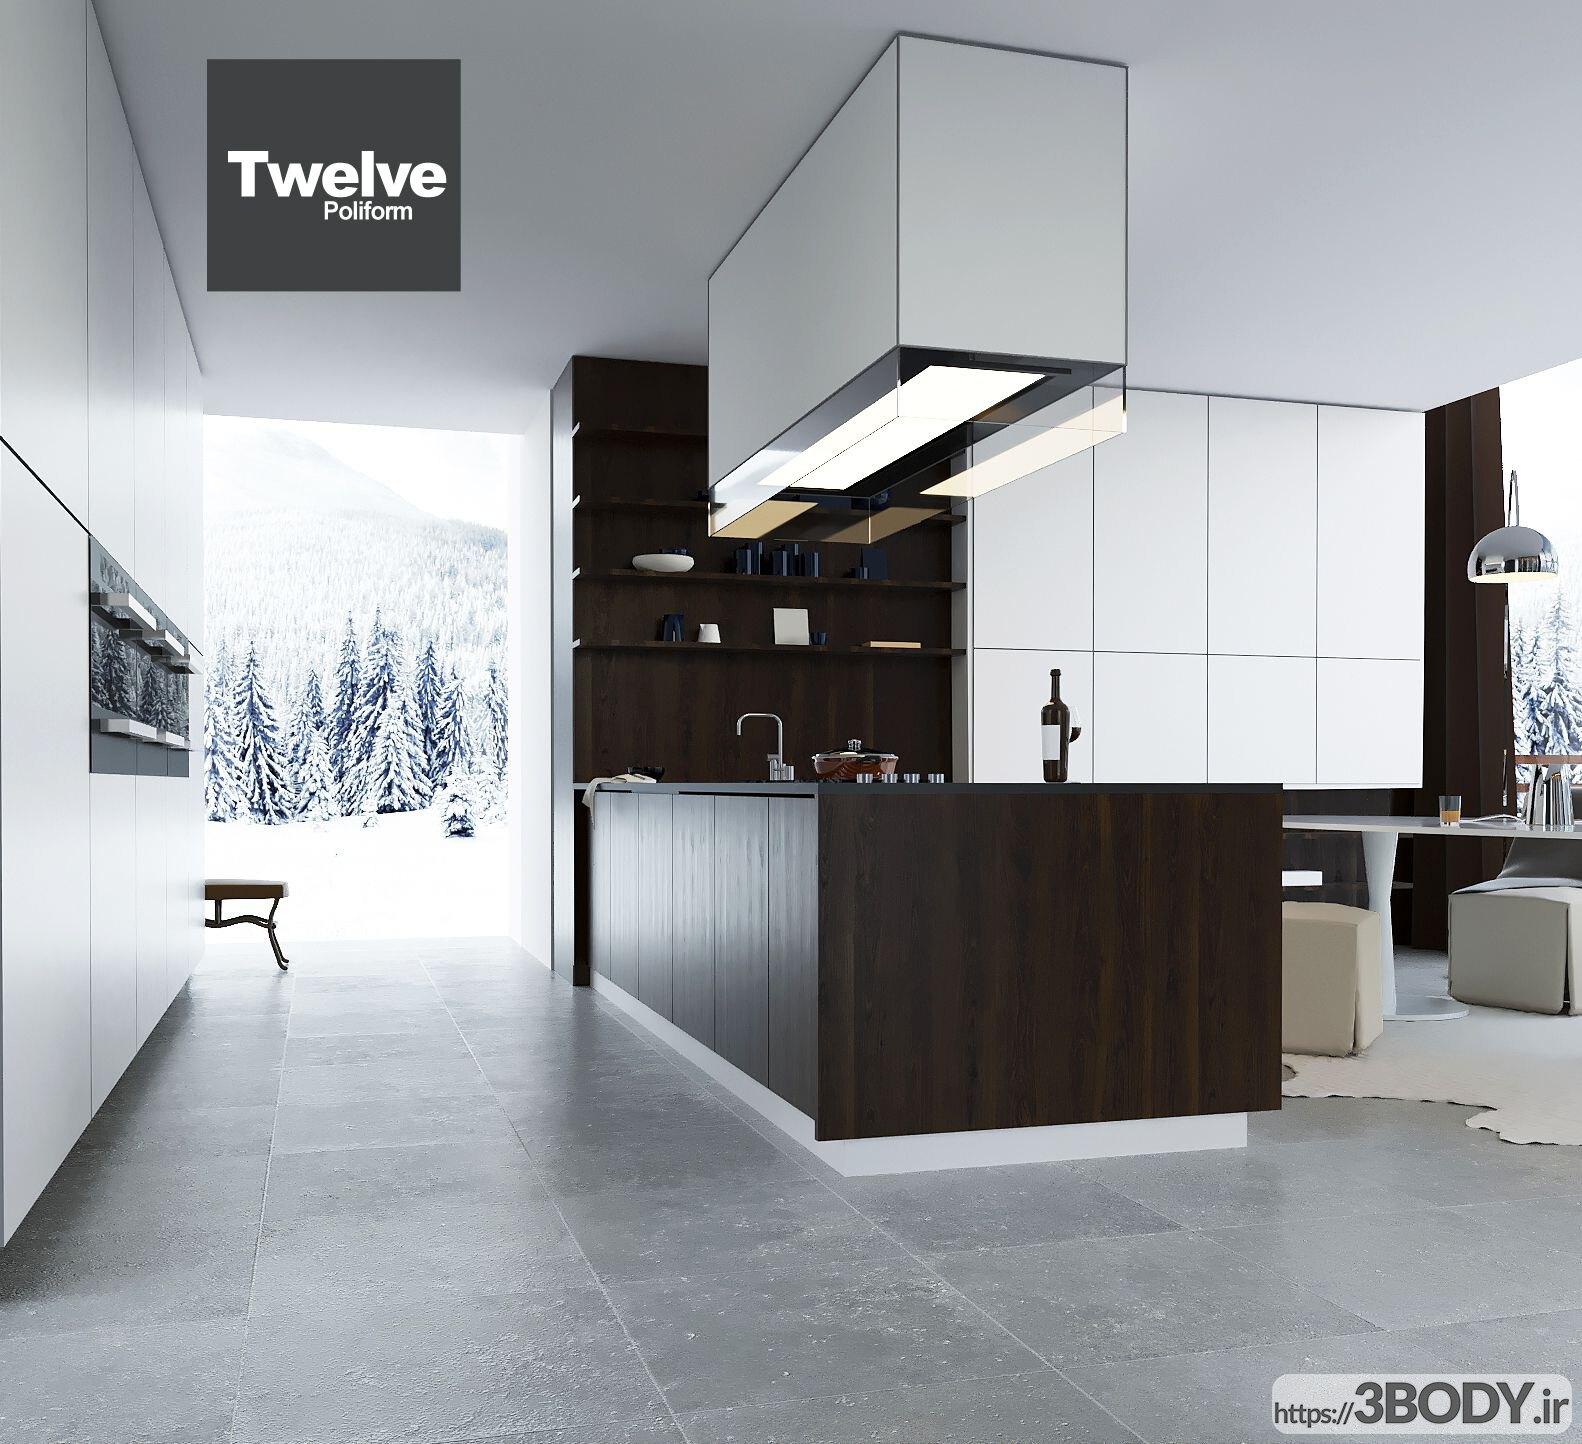 مدل سه بعدی دکوراسیون آشپزخانه عکس 4